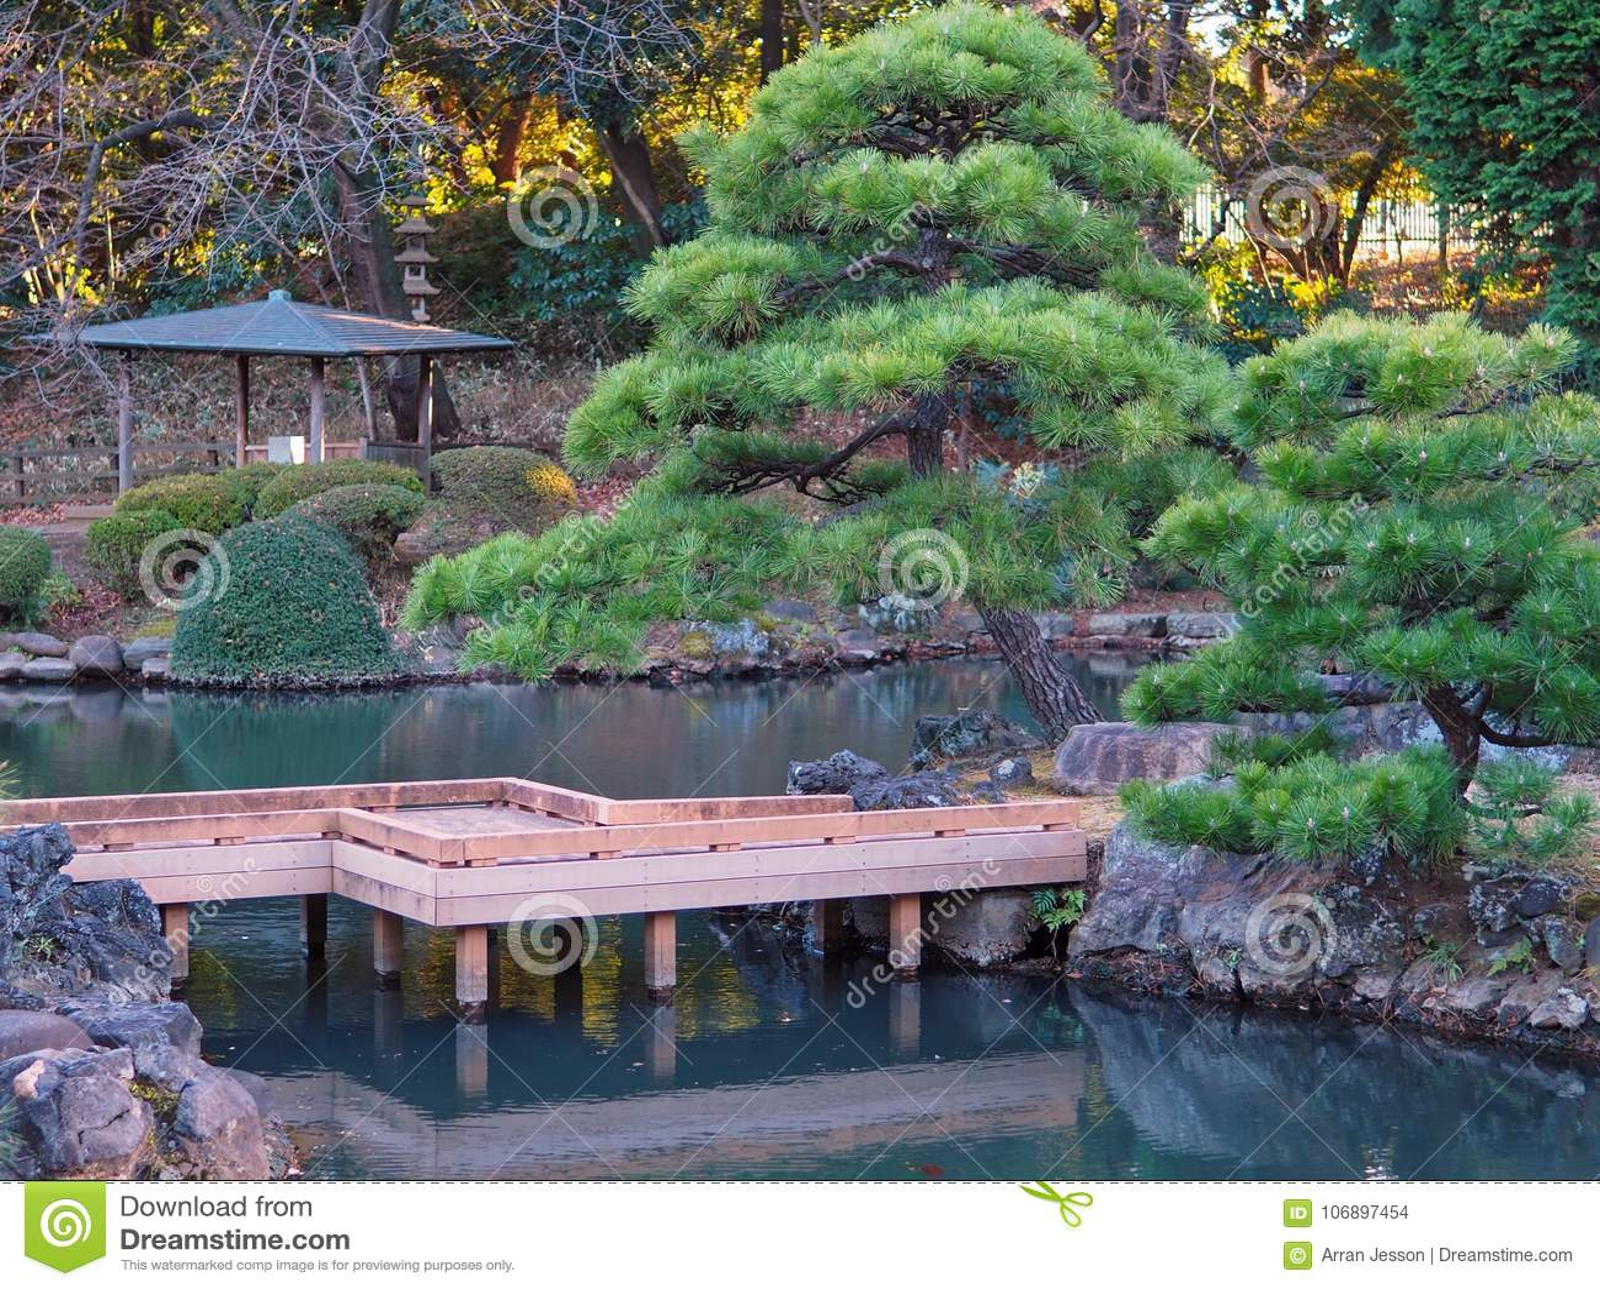 Japanese Water Garden In Tokyo